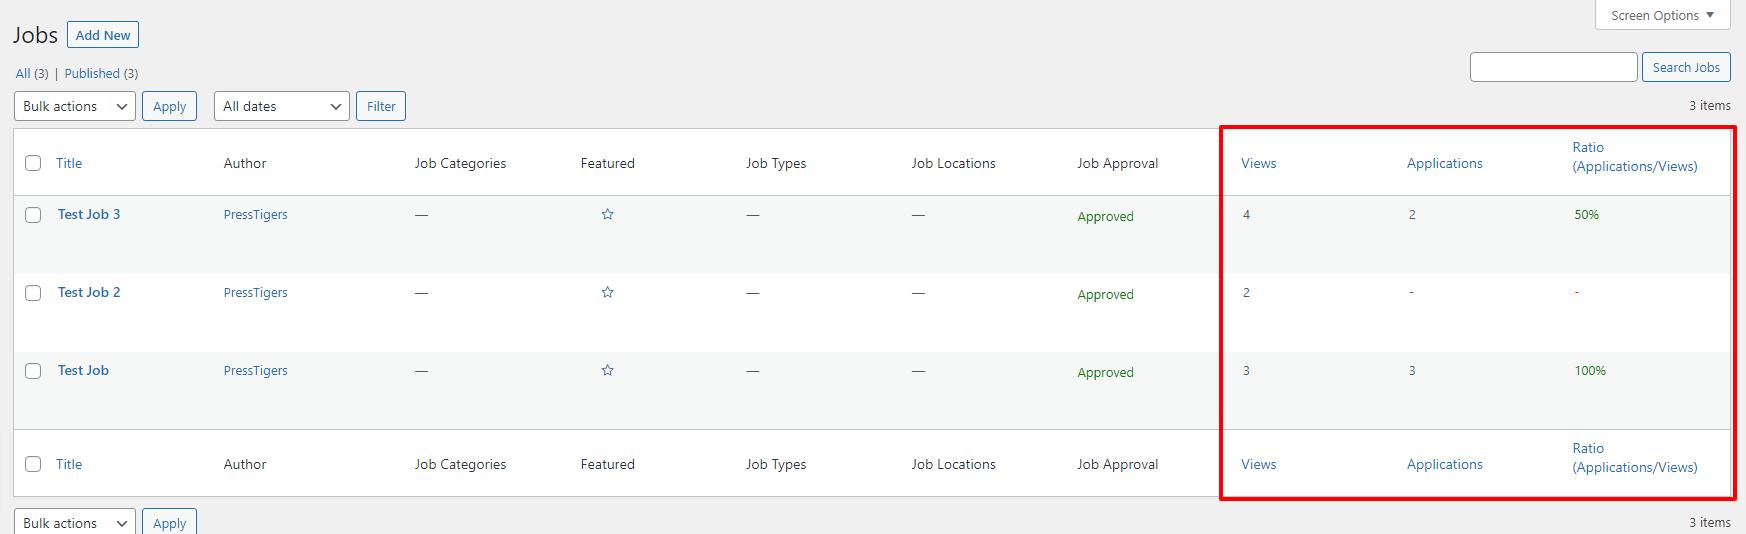 Job-Applications-Counter for Simple Job Board